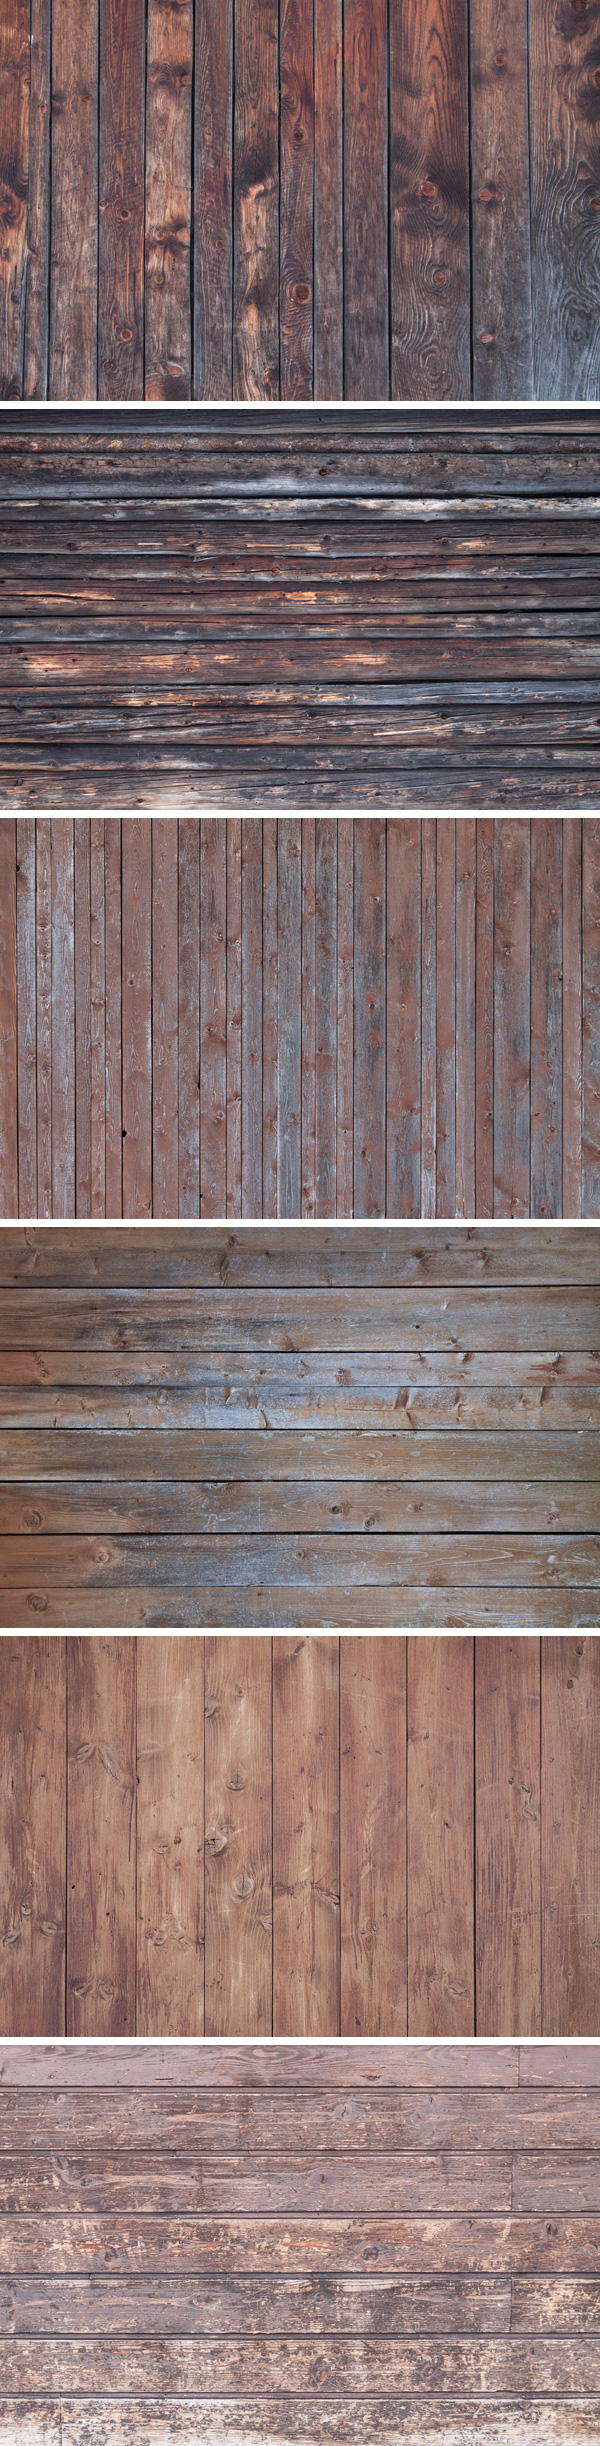 6 Vintage Wood Textures Vol 4 Graphicburger